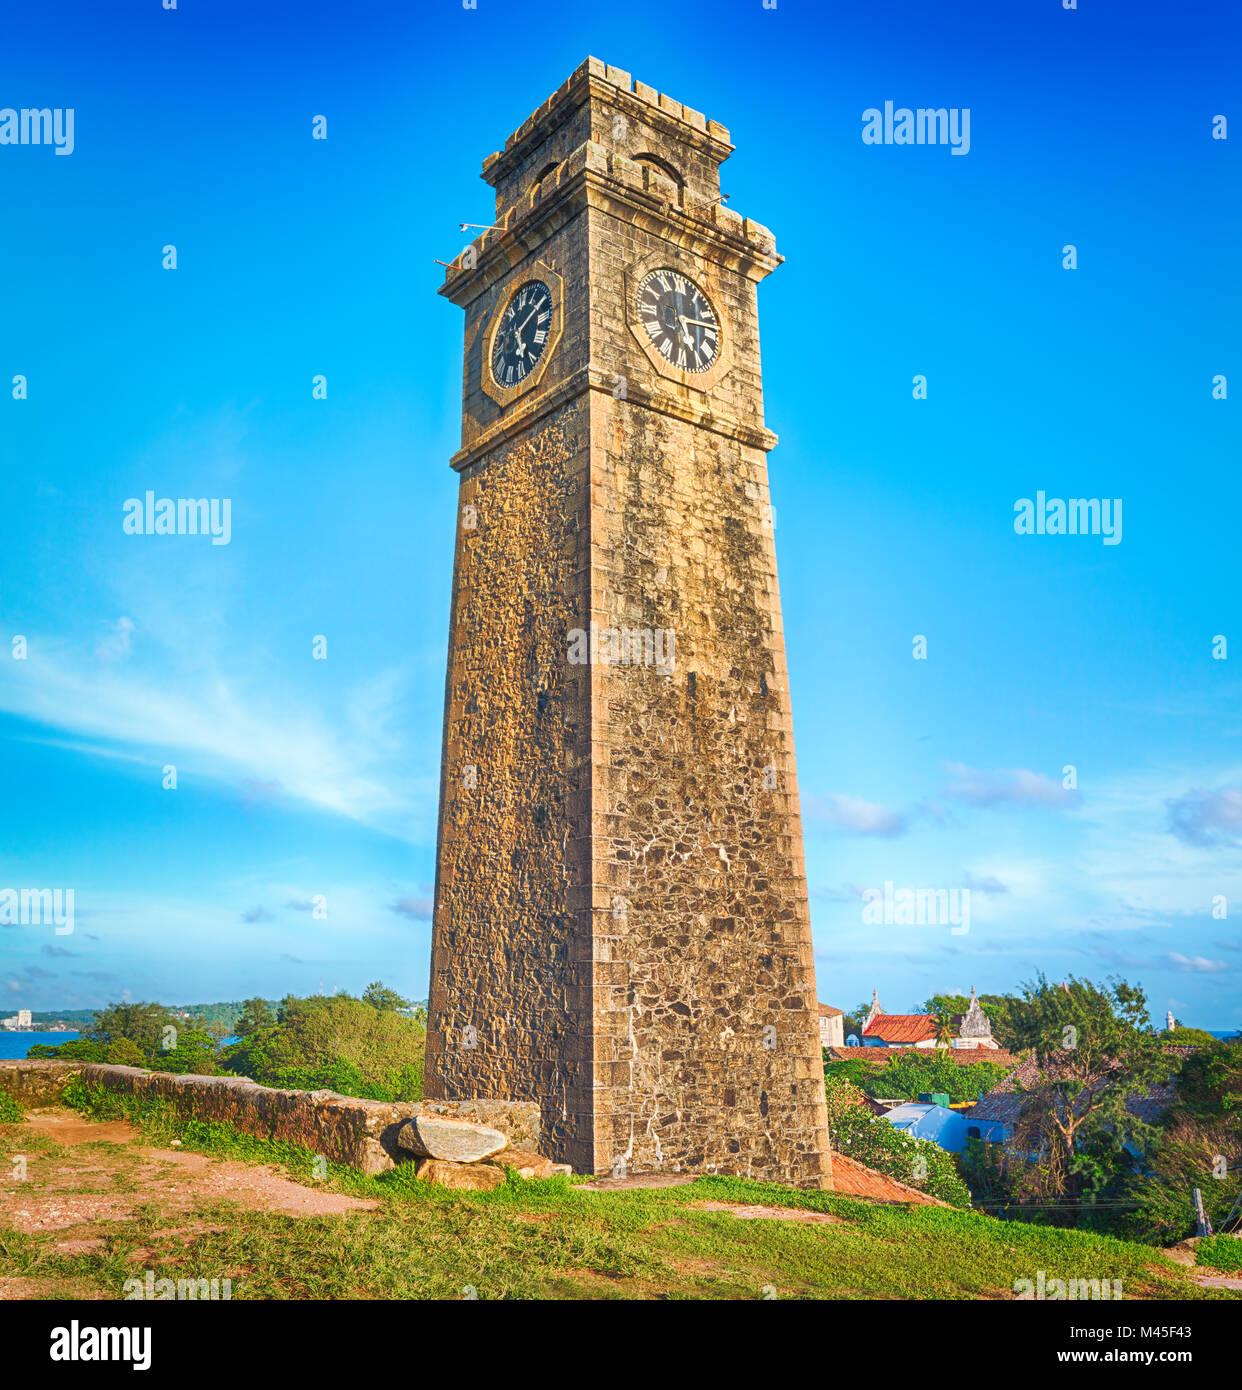 Anthonisz Memorial Clock Tower in Galle, Sri Lanka - Stock Image